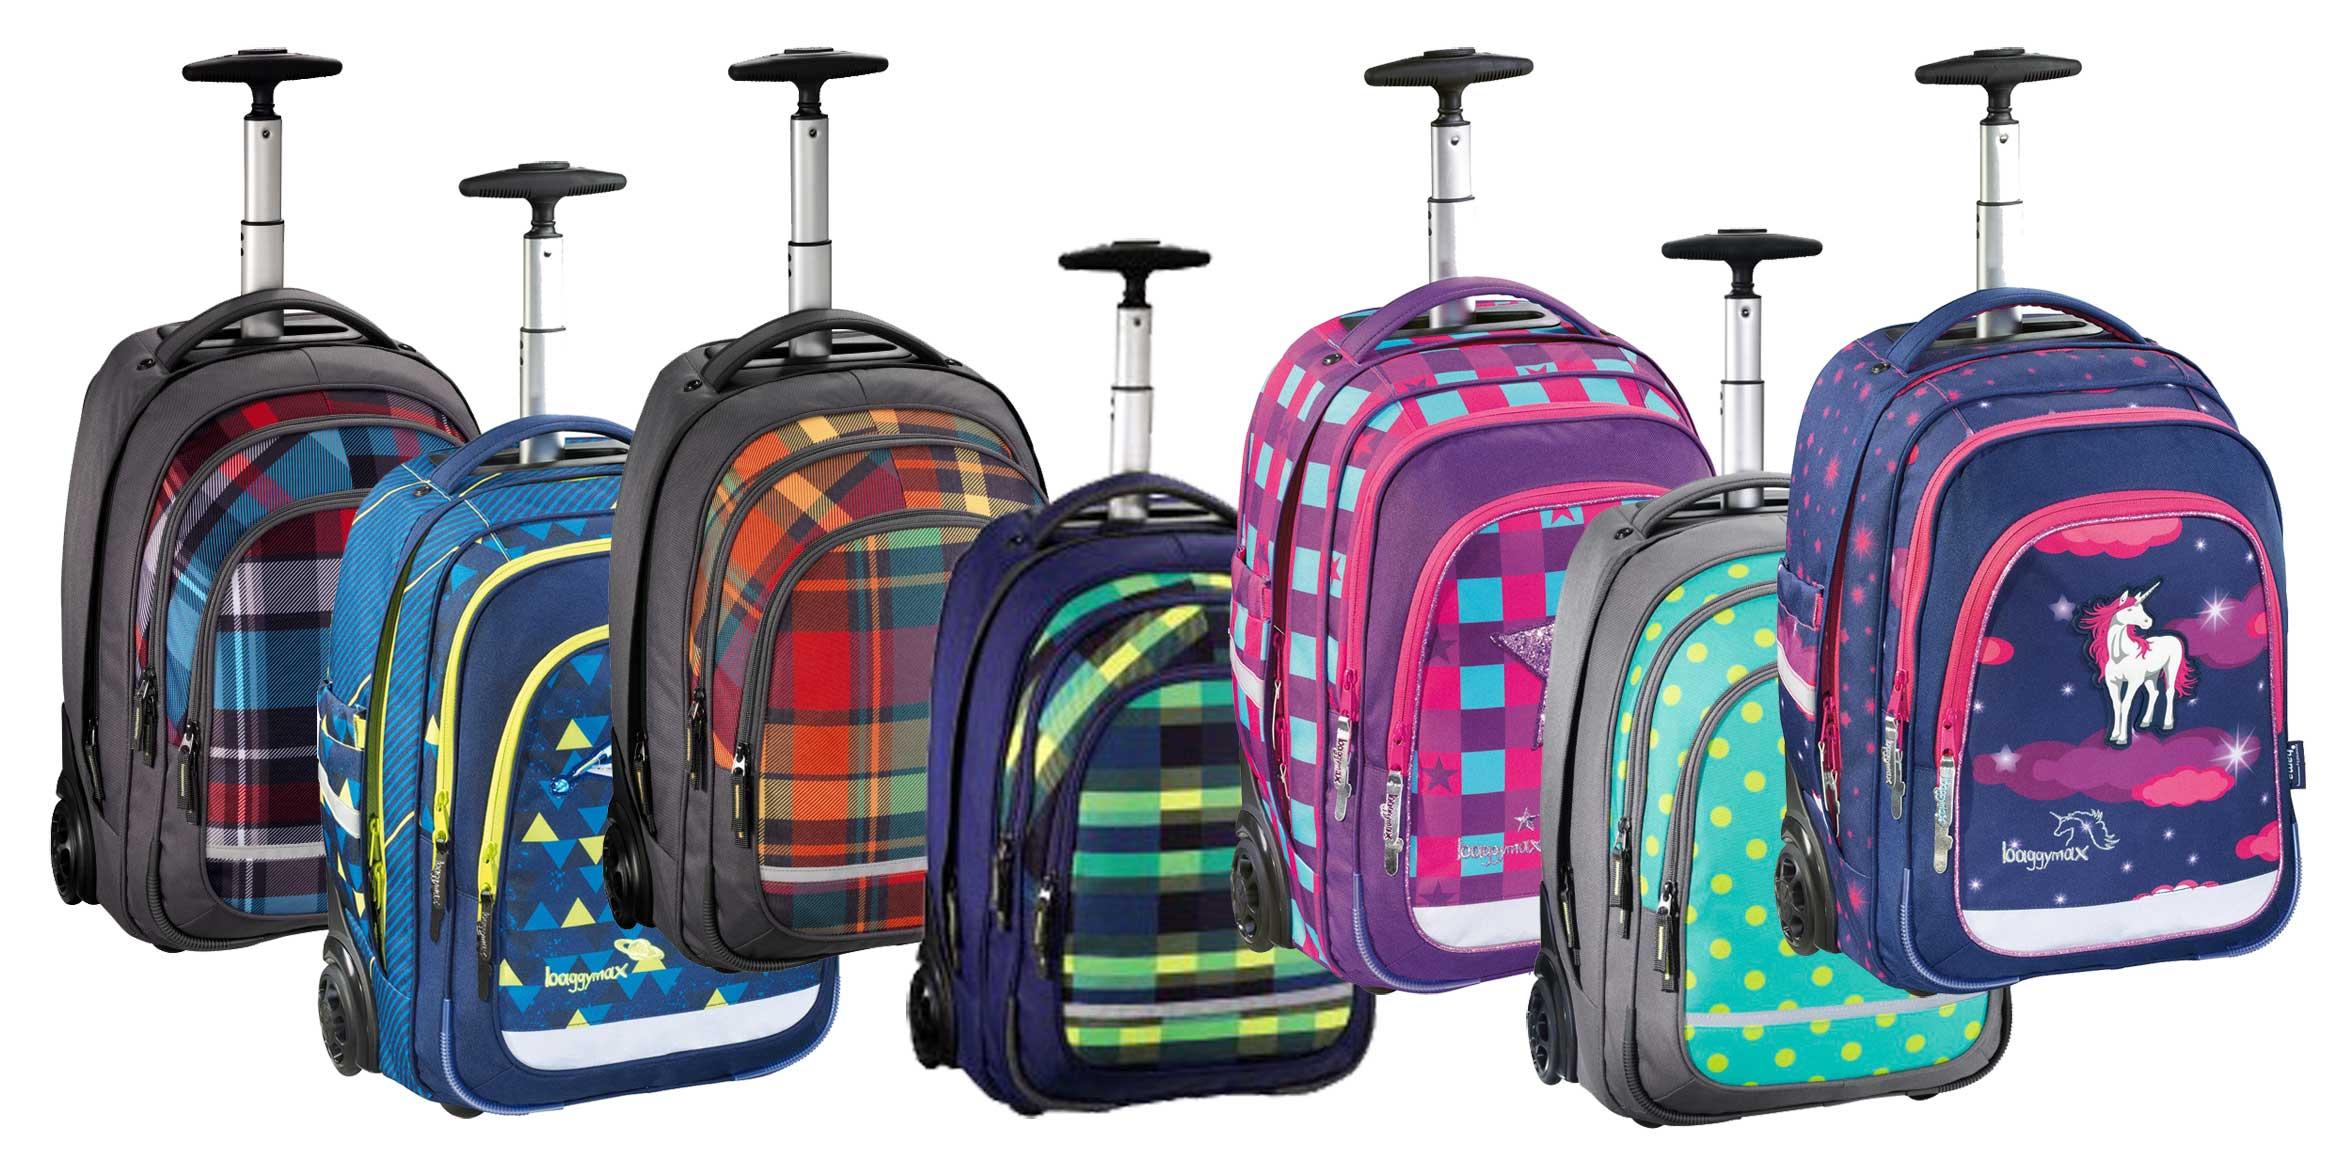 4e2fef10fb Školské tašky na kolieskach e-shop